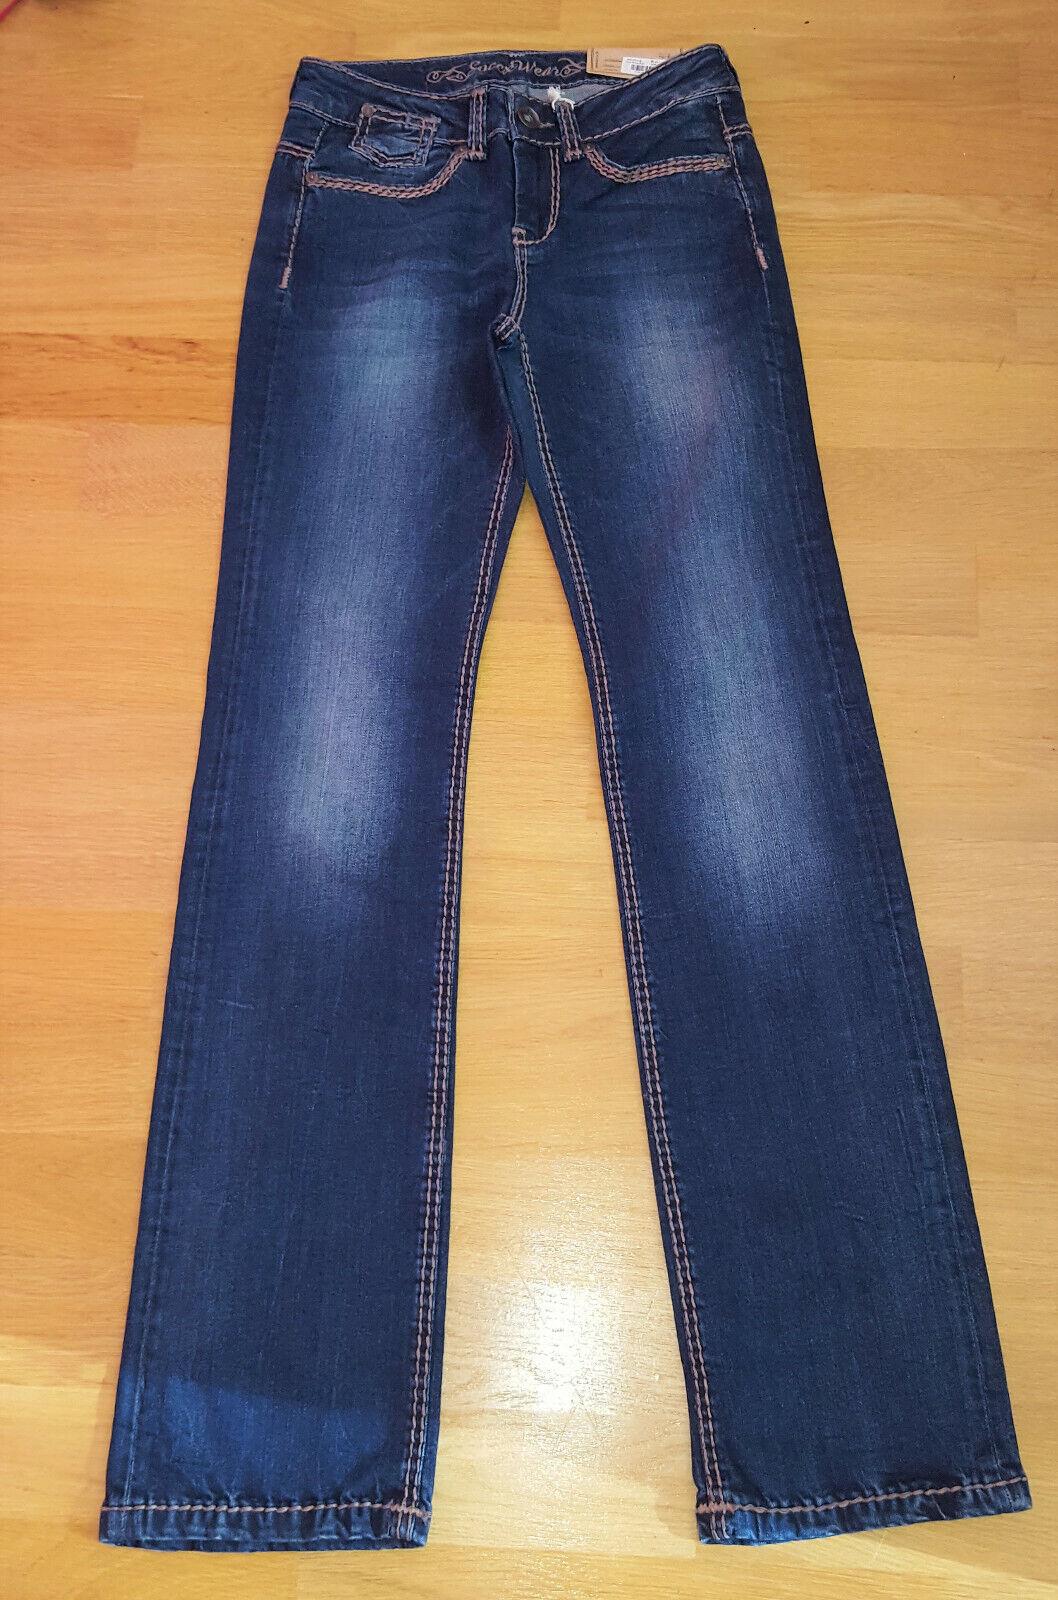 Jeans Damen Soccx blau Größe W26 l32 comfort fit neu mit Etikett